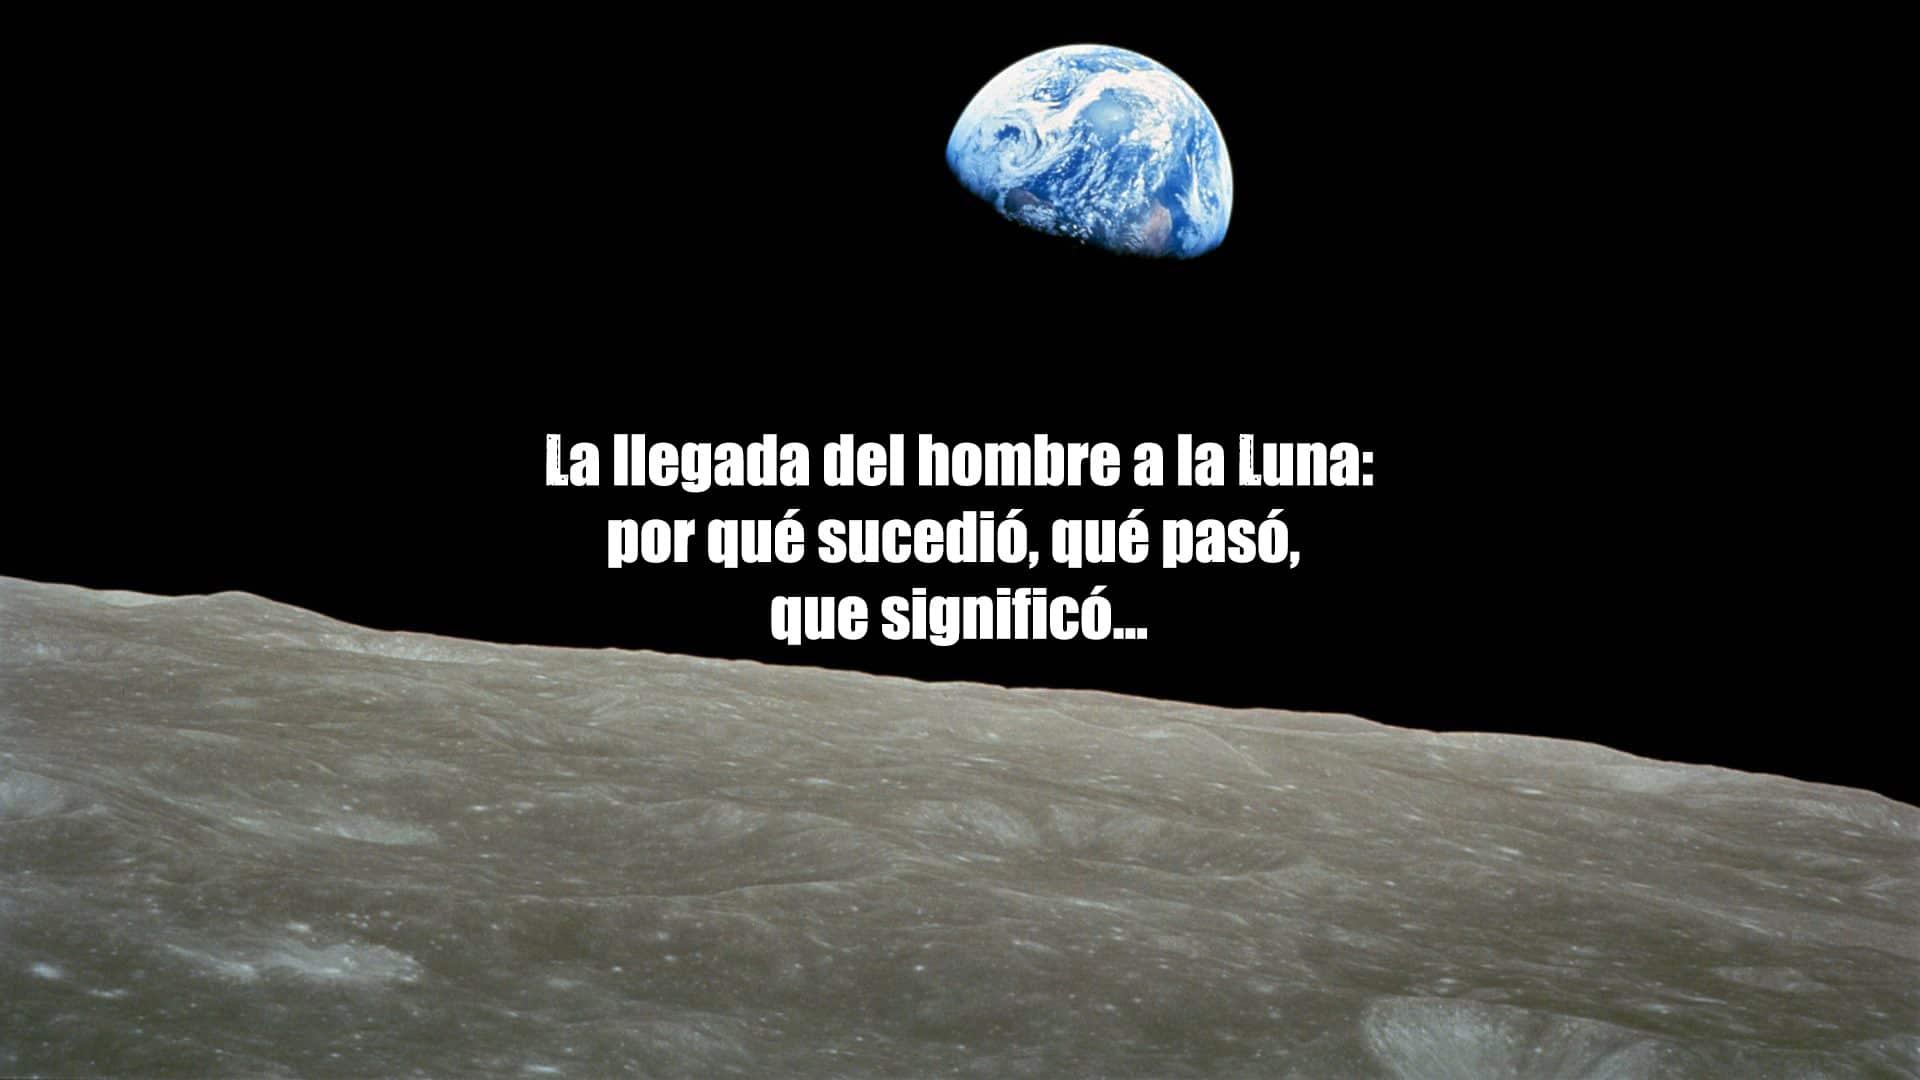 La llegada del hombre a la Luna: por qué sucedió, que significó…